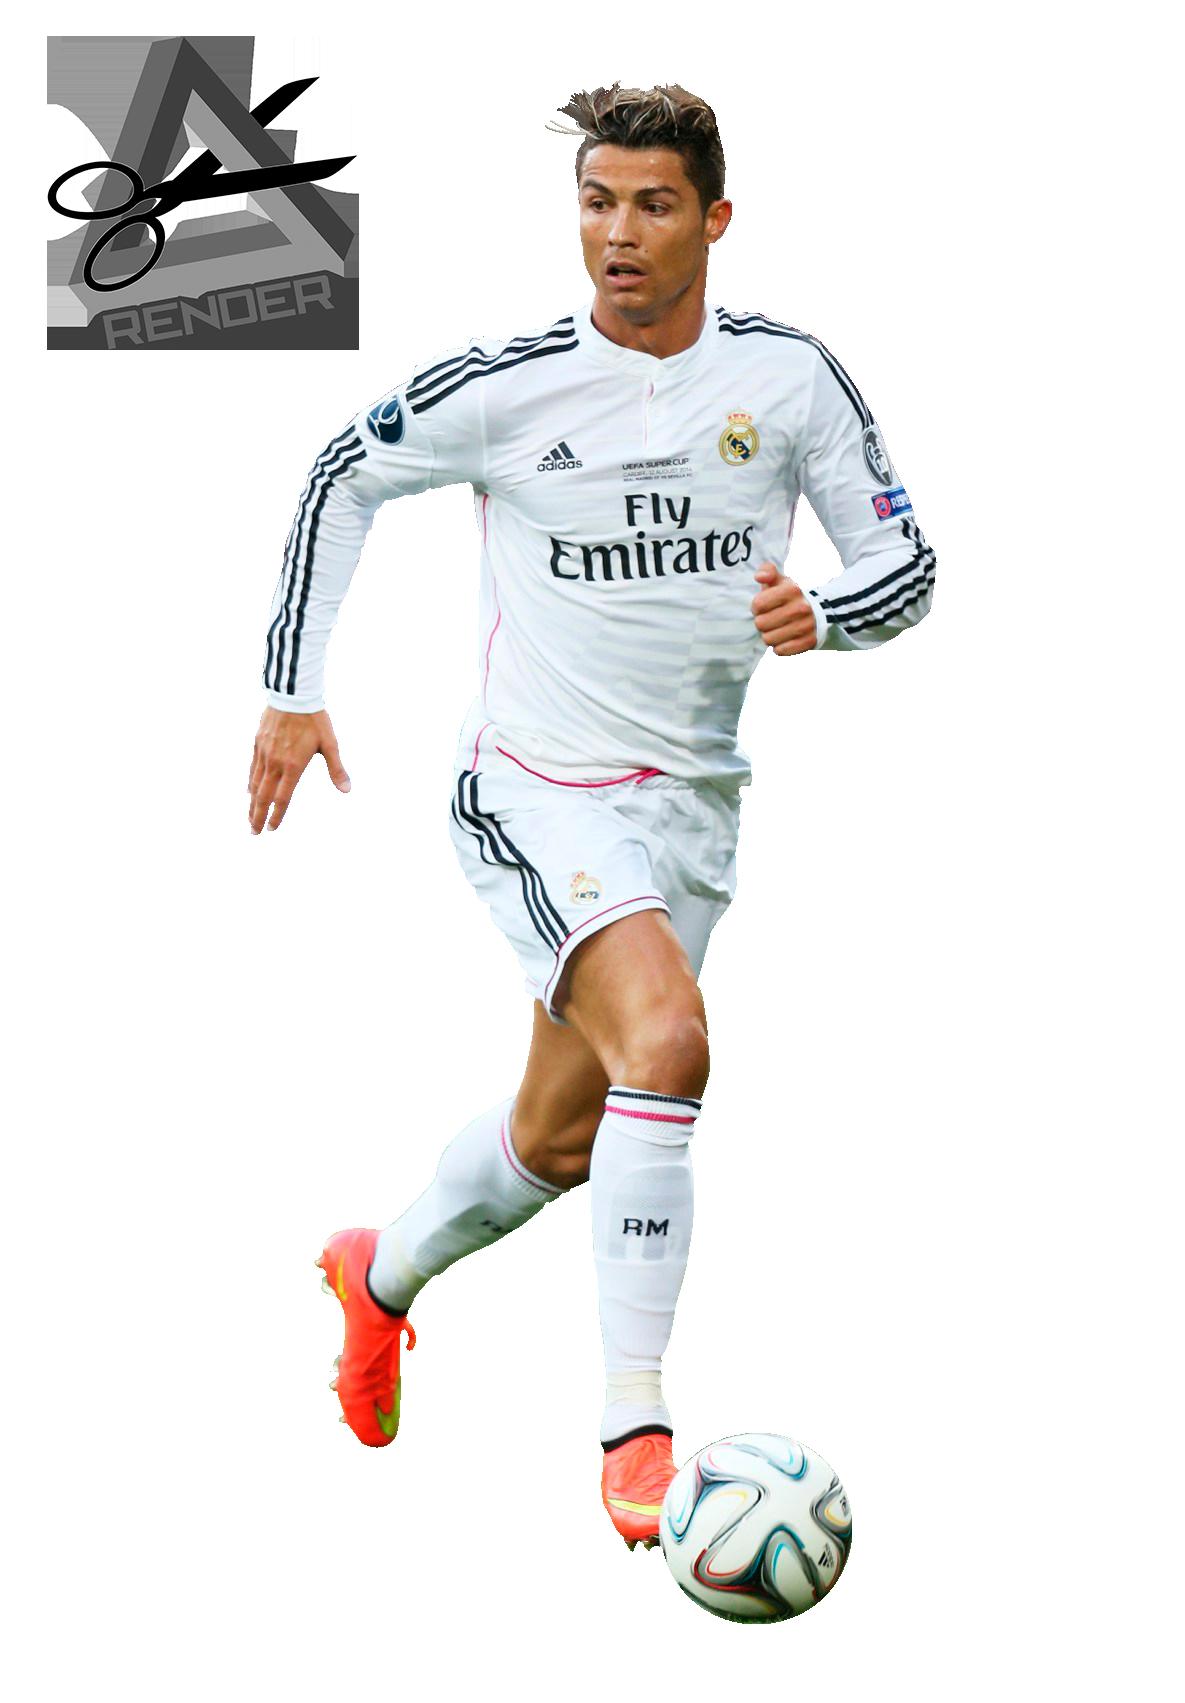 Cristiano Ronaldo CR7 Real Madrid Wallpaper 1920x1080 px 1185x1703